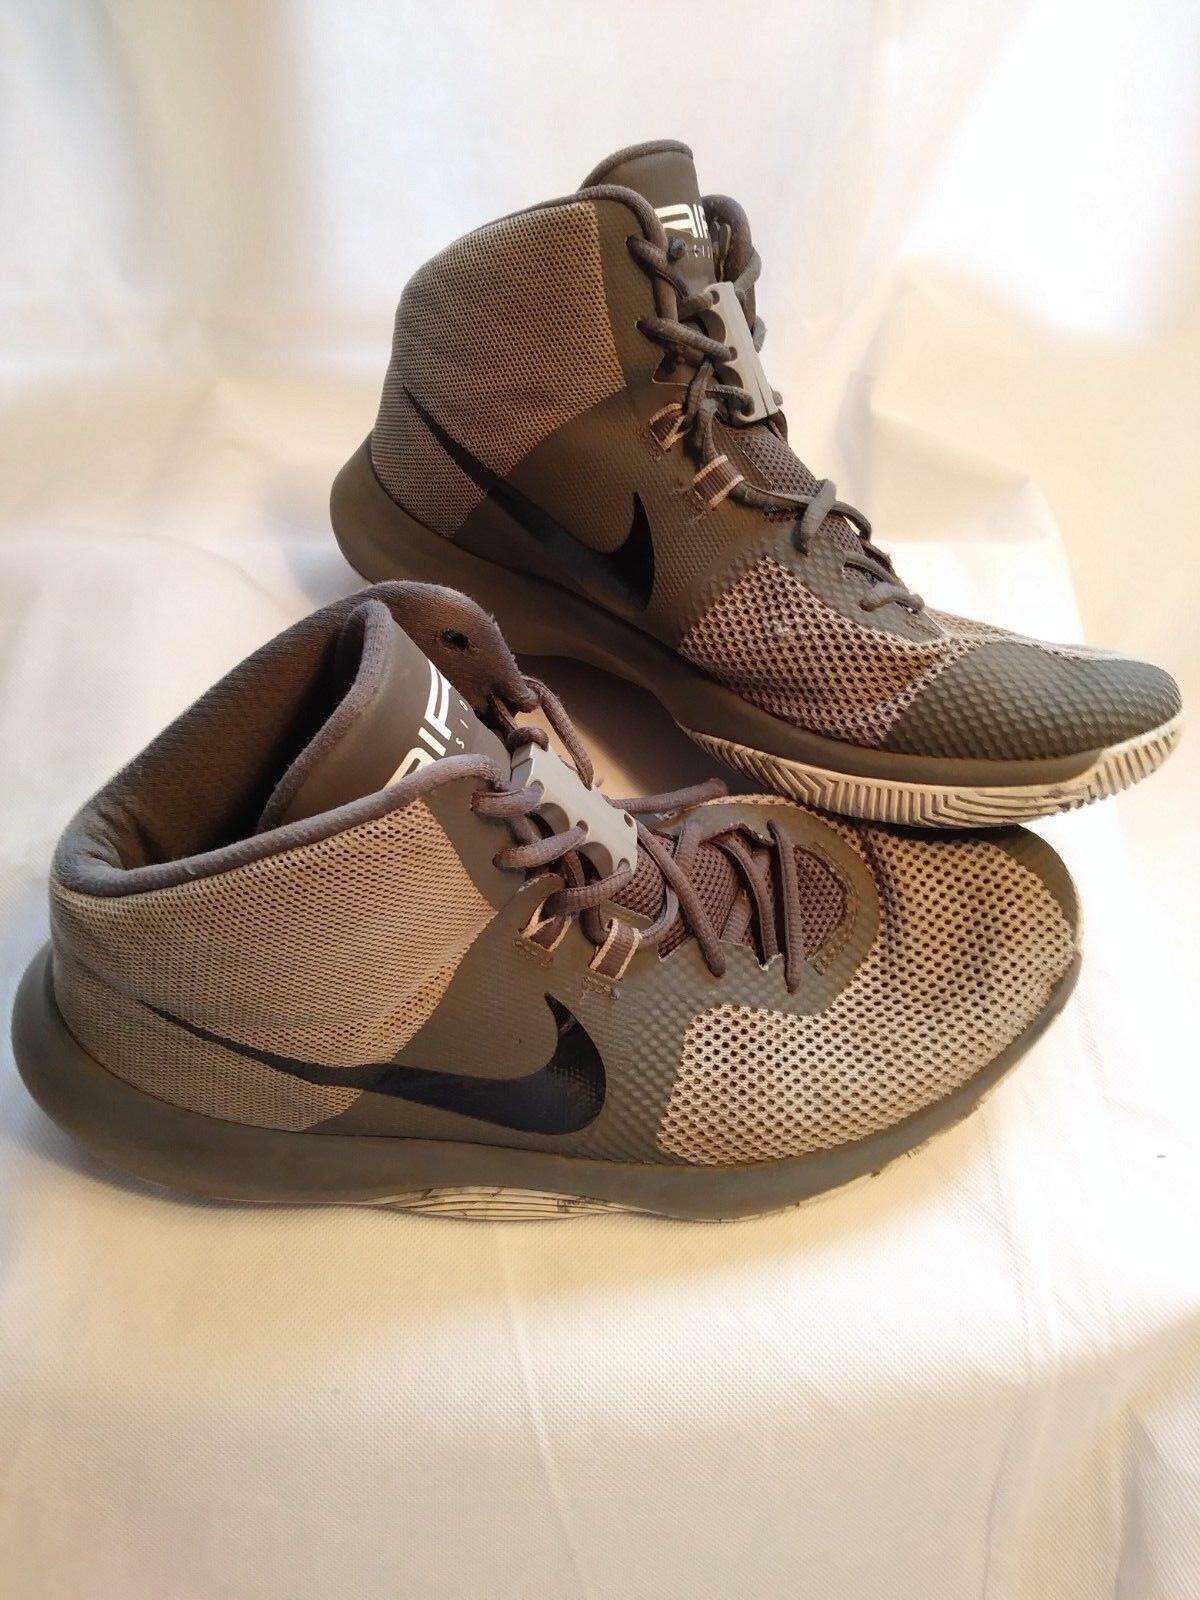 e8ef3fb9970 Nike Air Precision Mens Basketball Shoes Size 11 Gray W Zubits ...